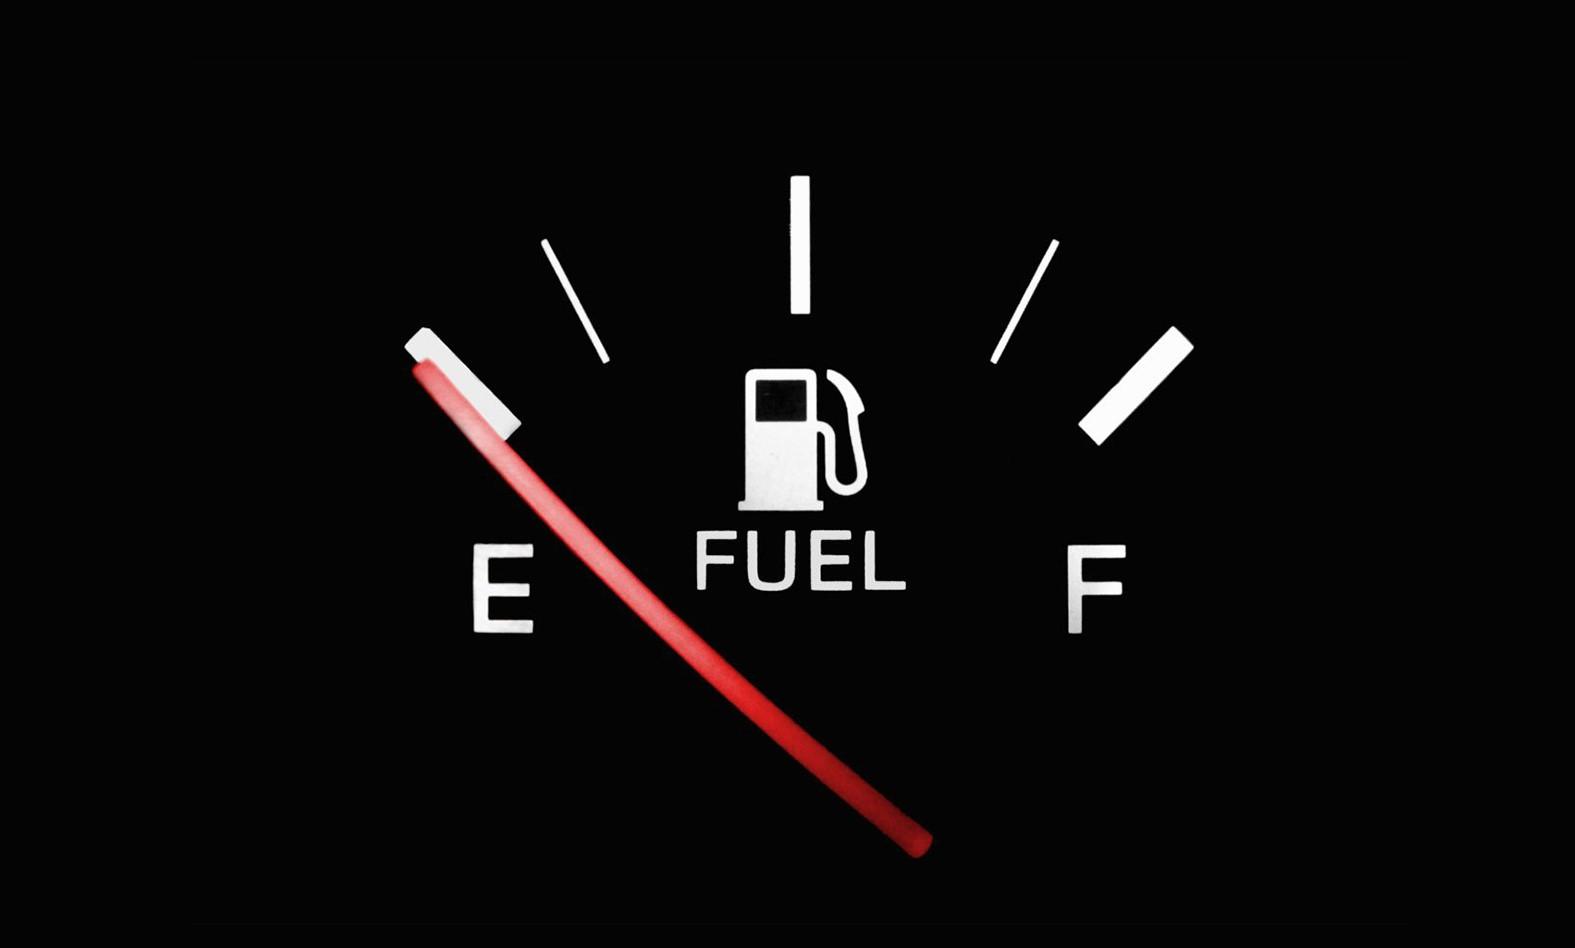 20210201-FuelShortage-SQR